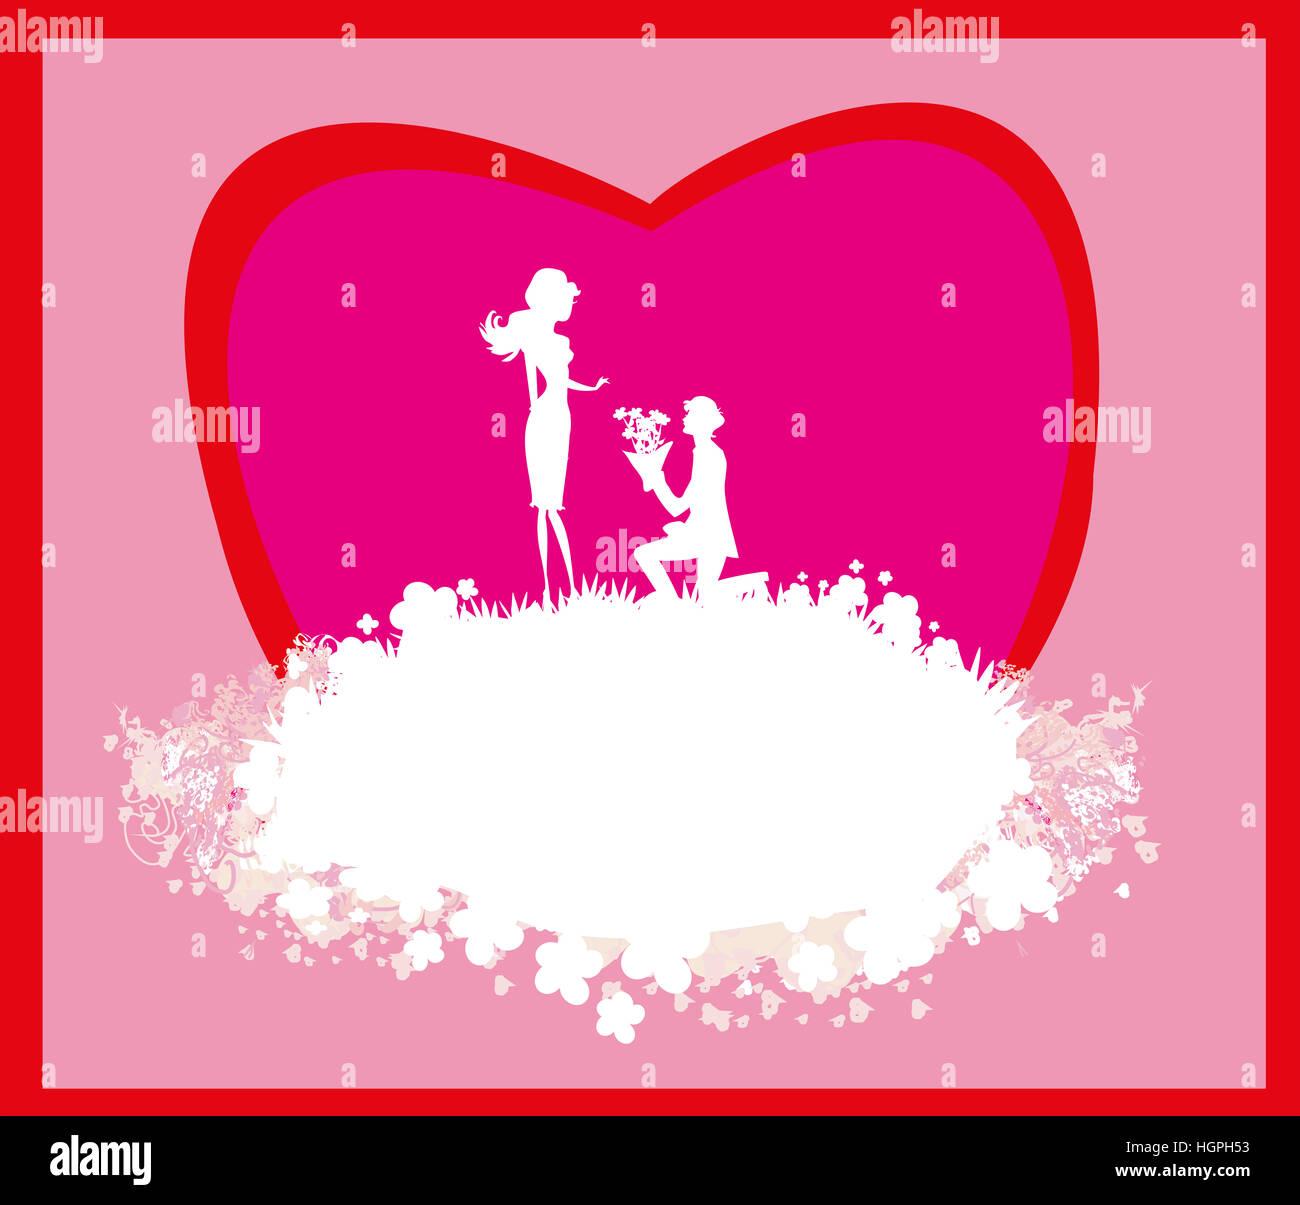 proposal wedding - couple silhouette card Stock Photo: 130803487 - Alamy